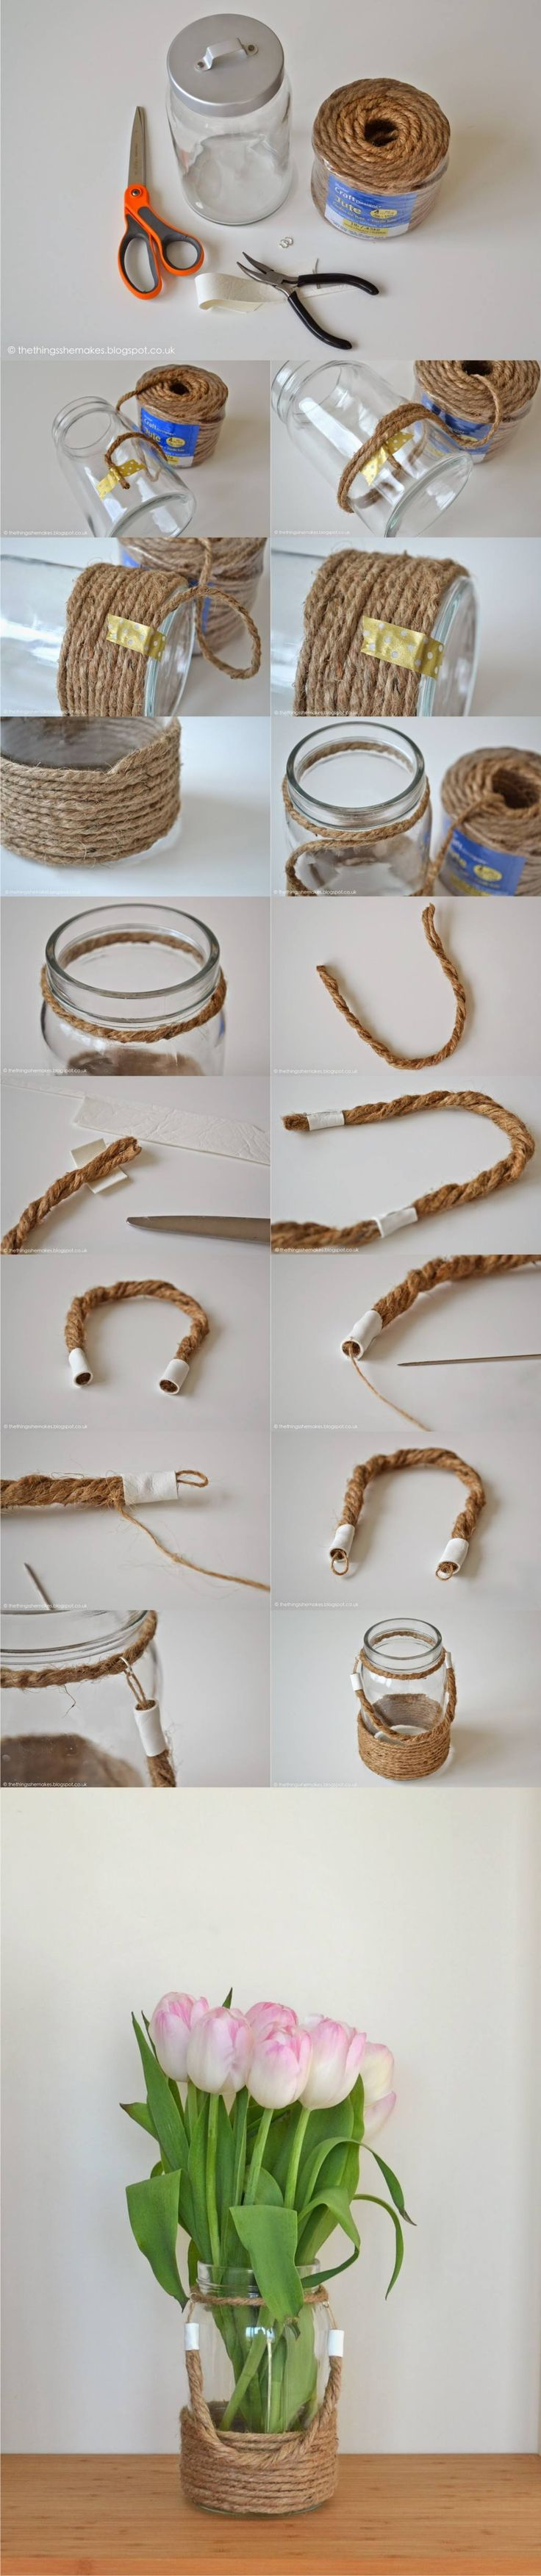 thethingsshemakes.blogspot.com - DIY Rope Wrapped Mason Jar